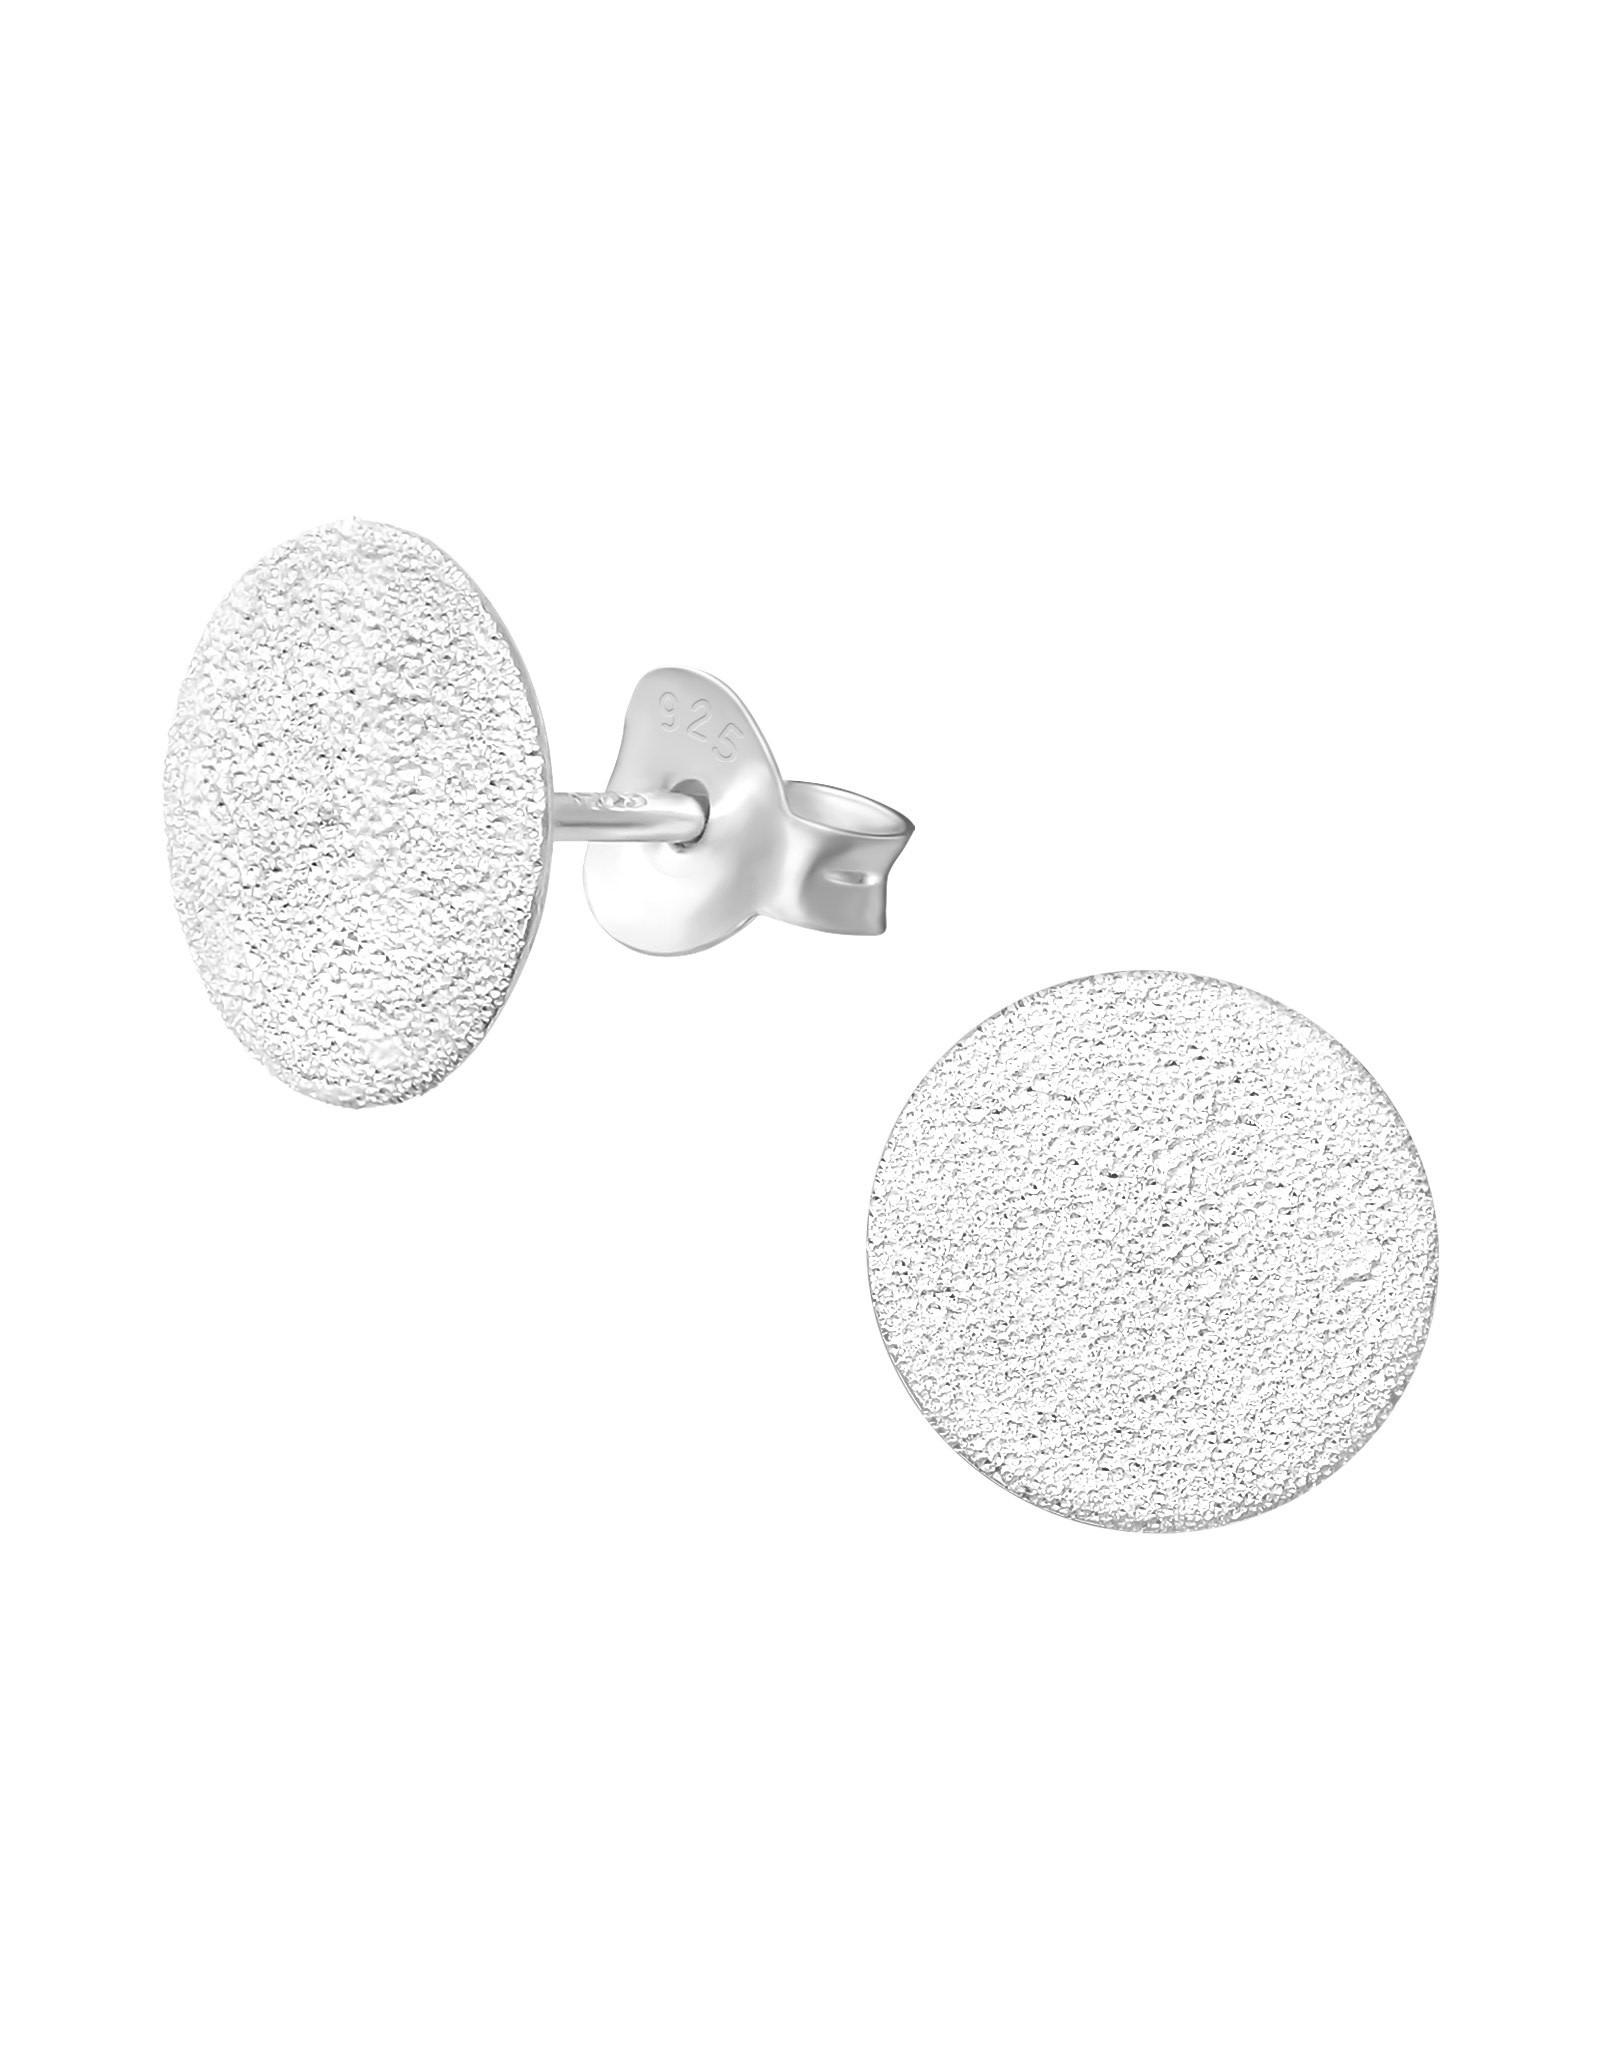 Stekertjes zilver schijfje mat 10mm